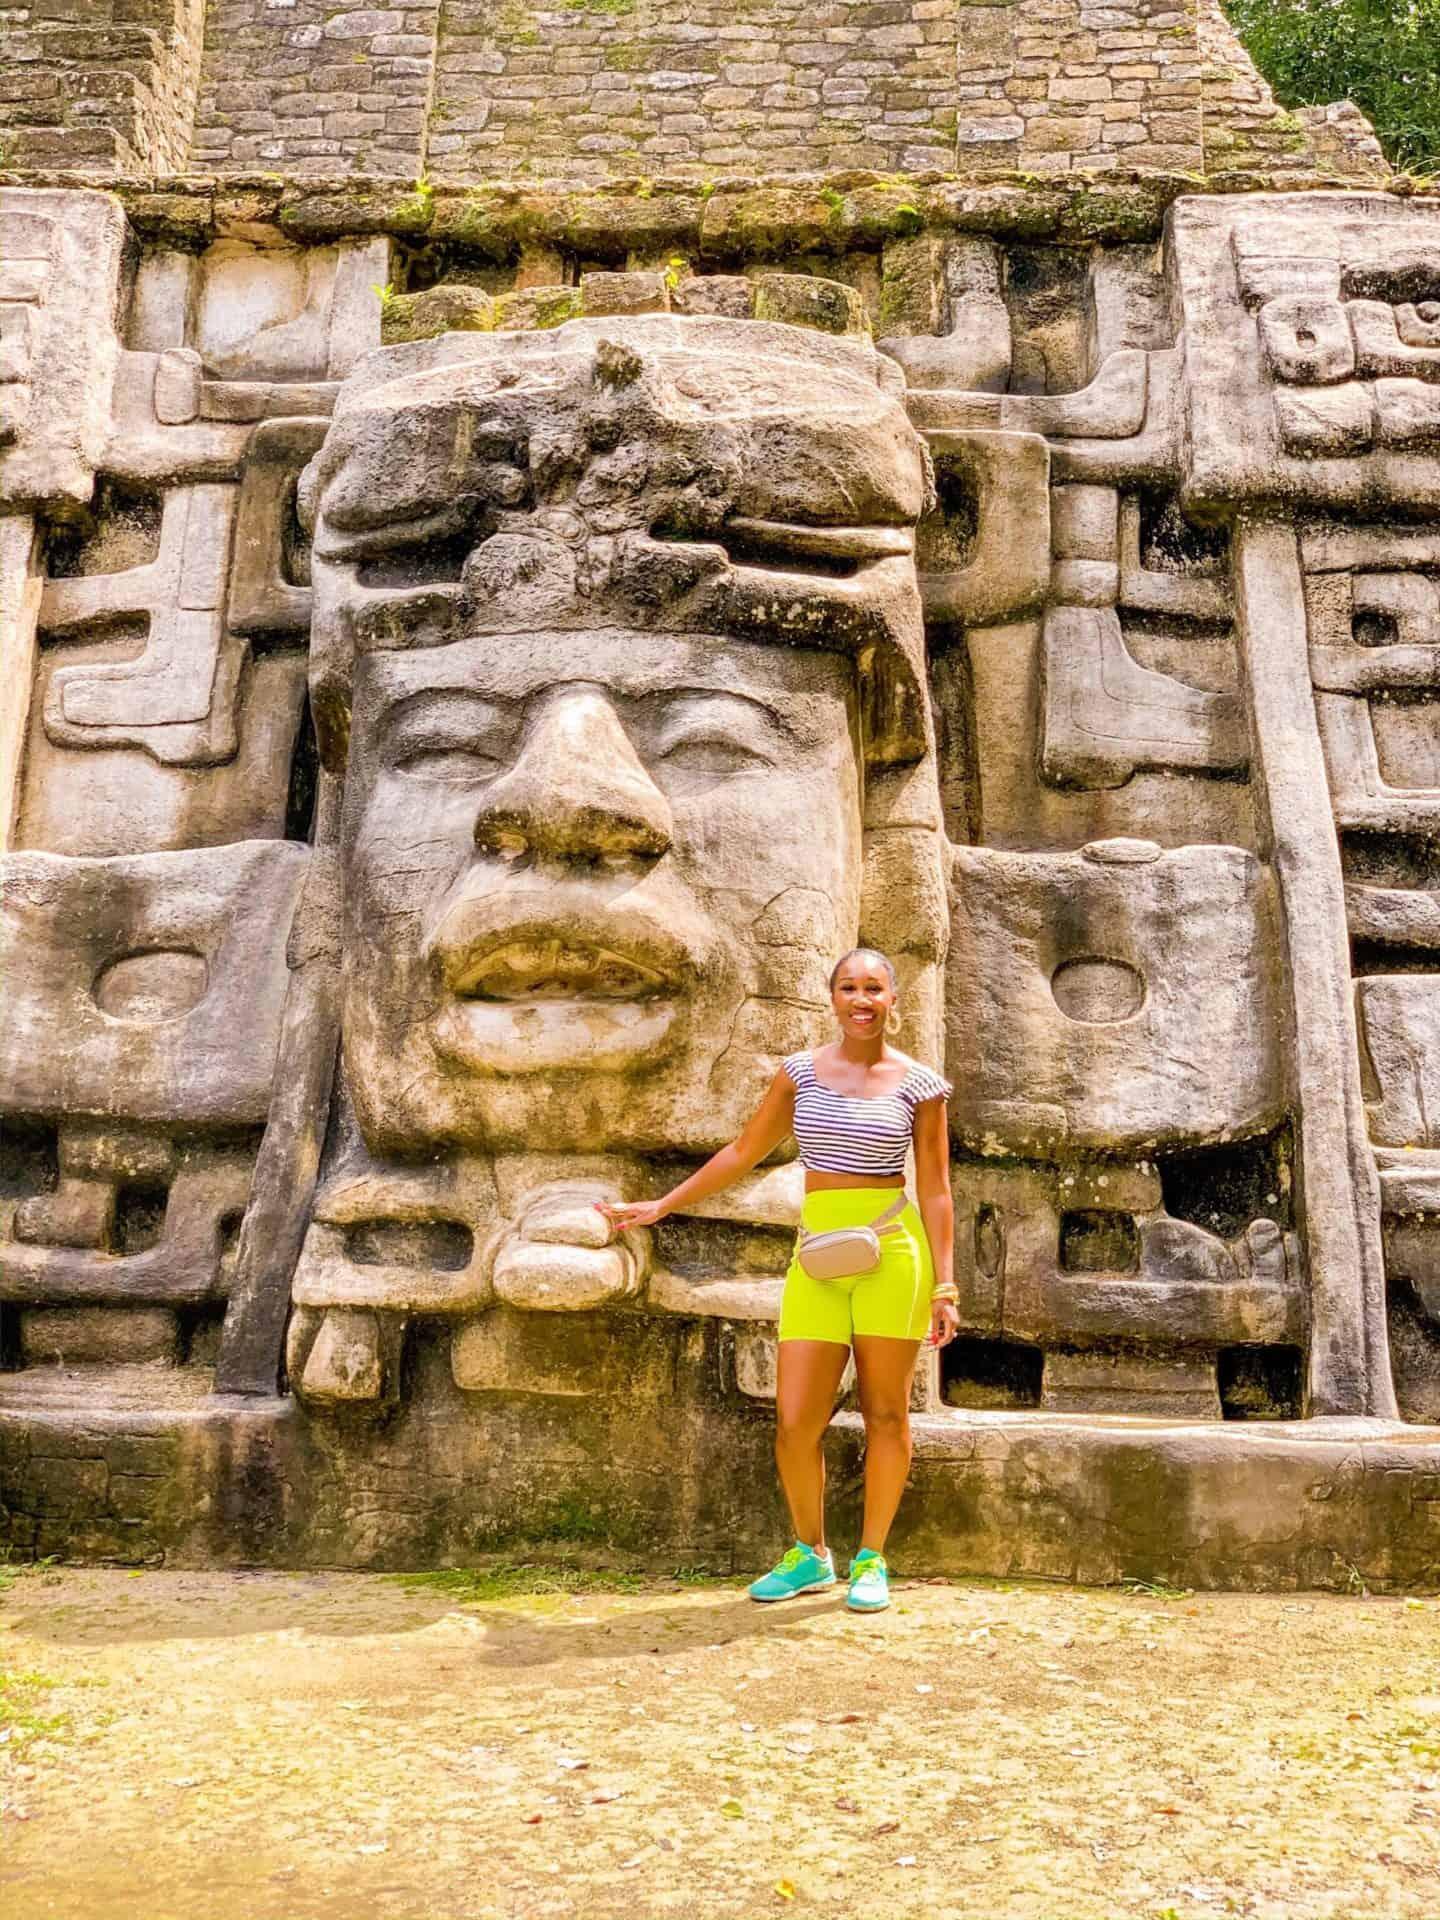 Tour of the Mayan Temples | Shaunda Necole